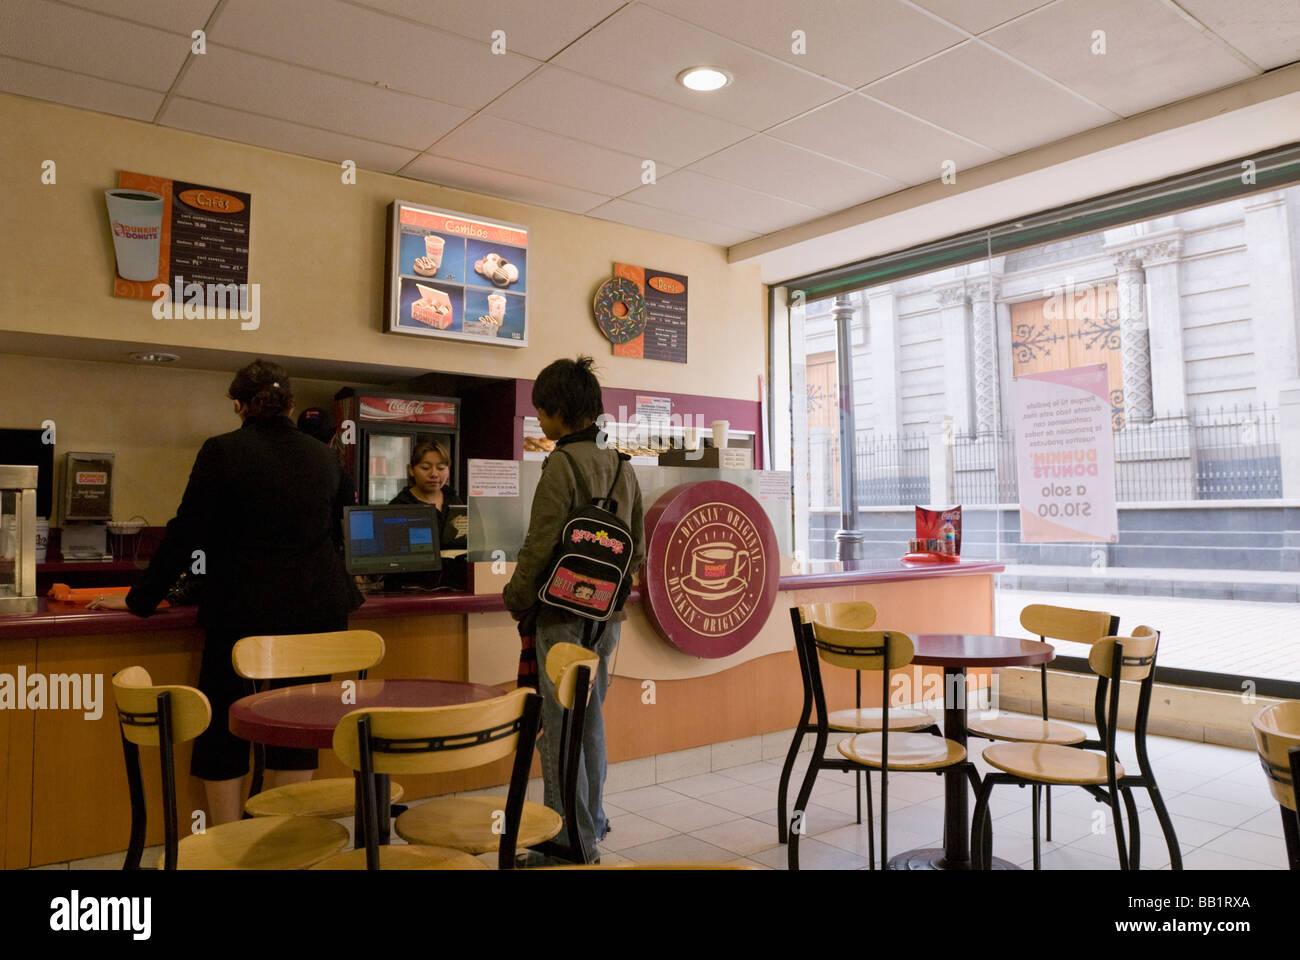 Dunkin Donuts Store Stock Photos  Dunkin Donuts Store Stock - Dunkin donuts location map usa